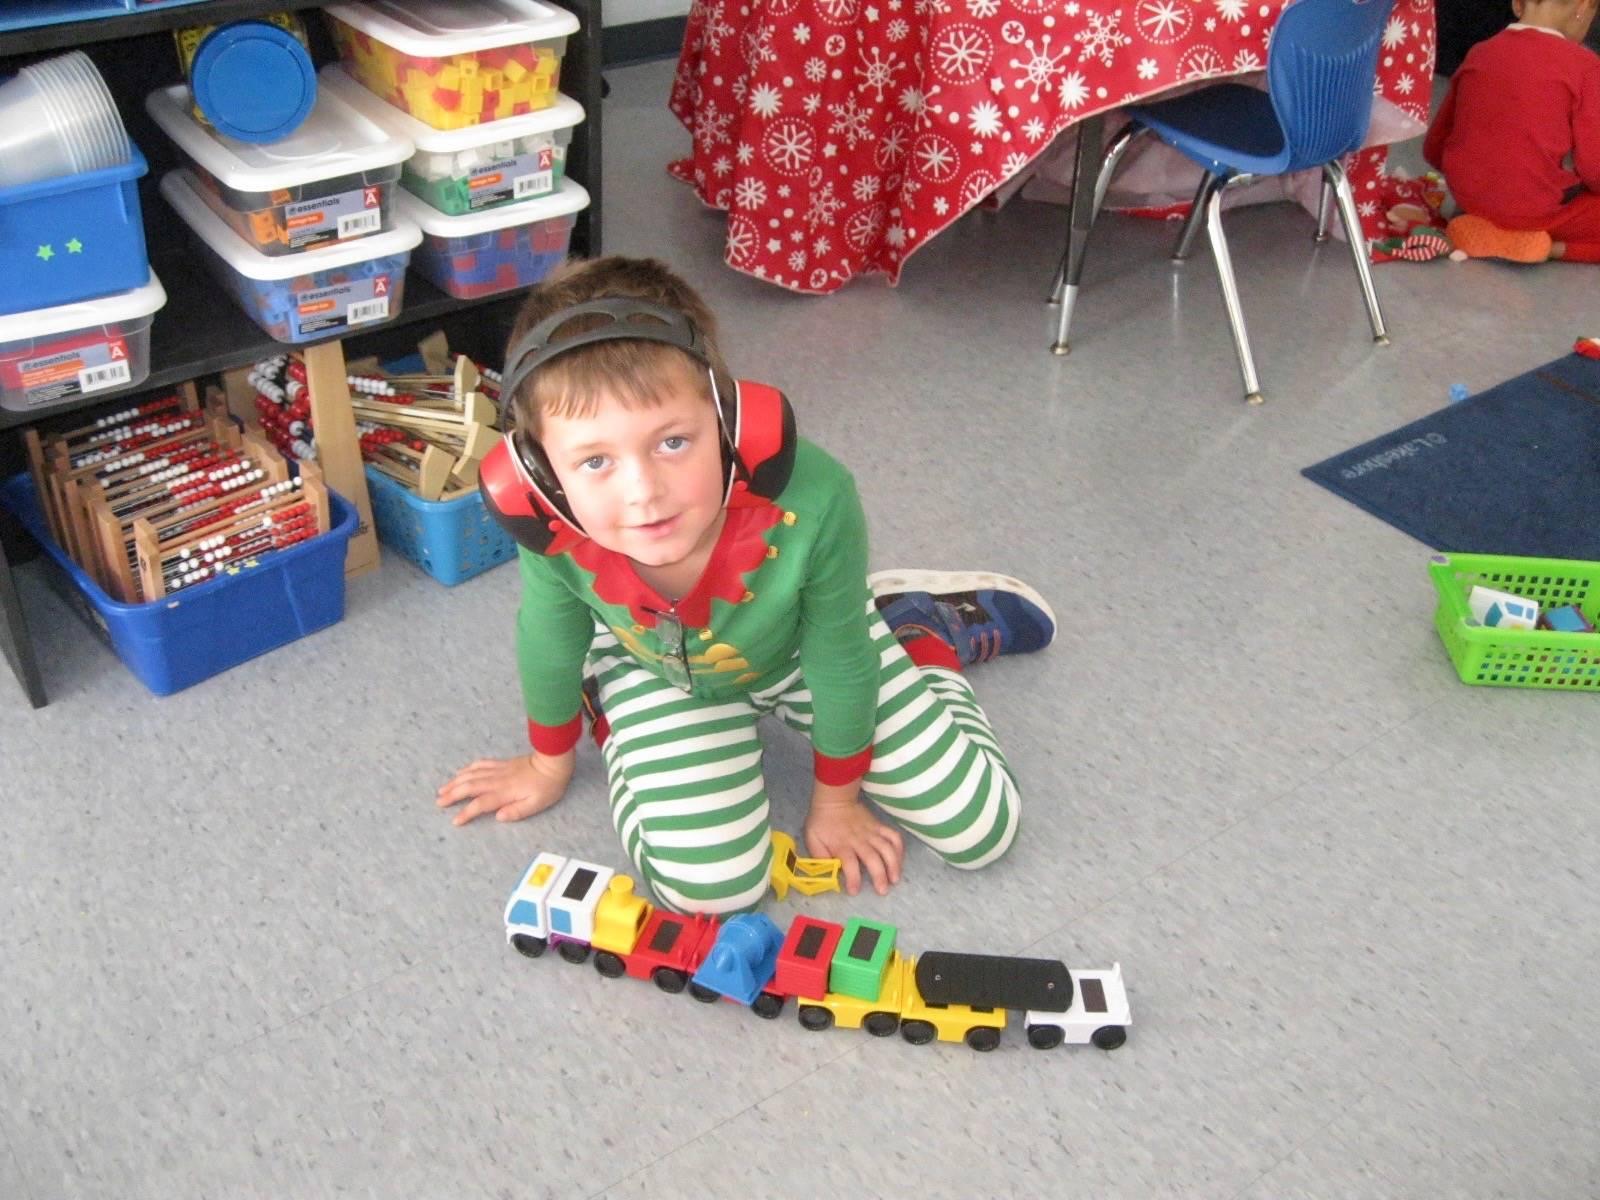 A student shows a train he built.